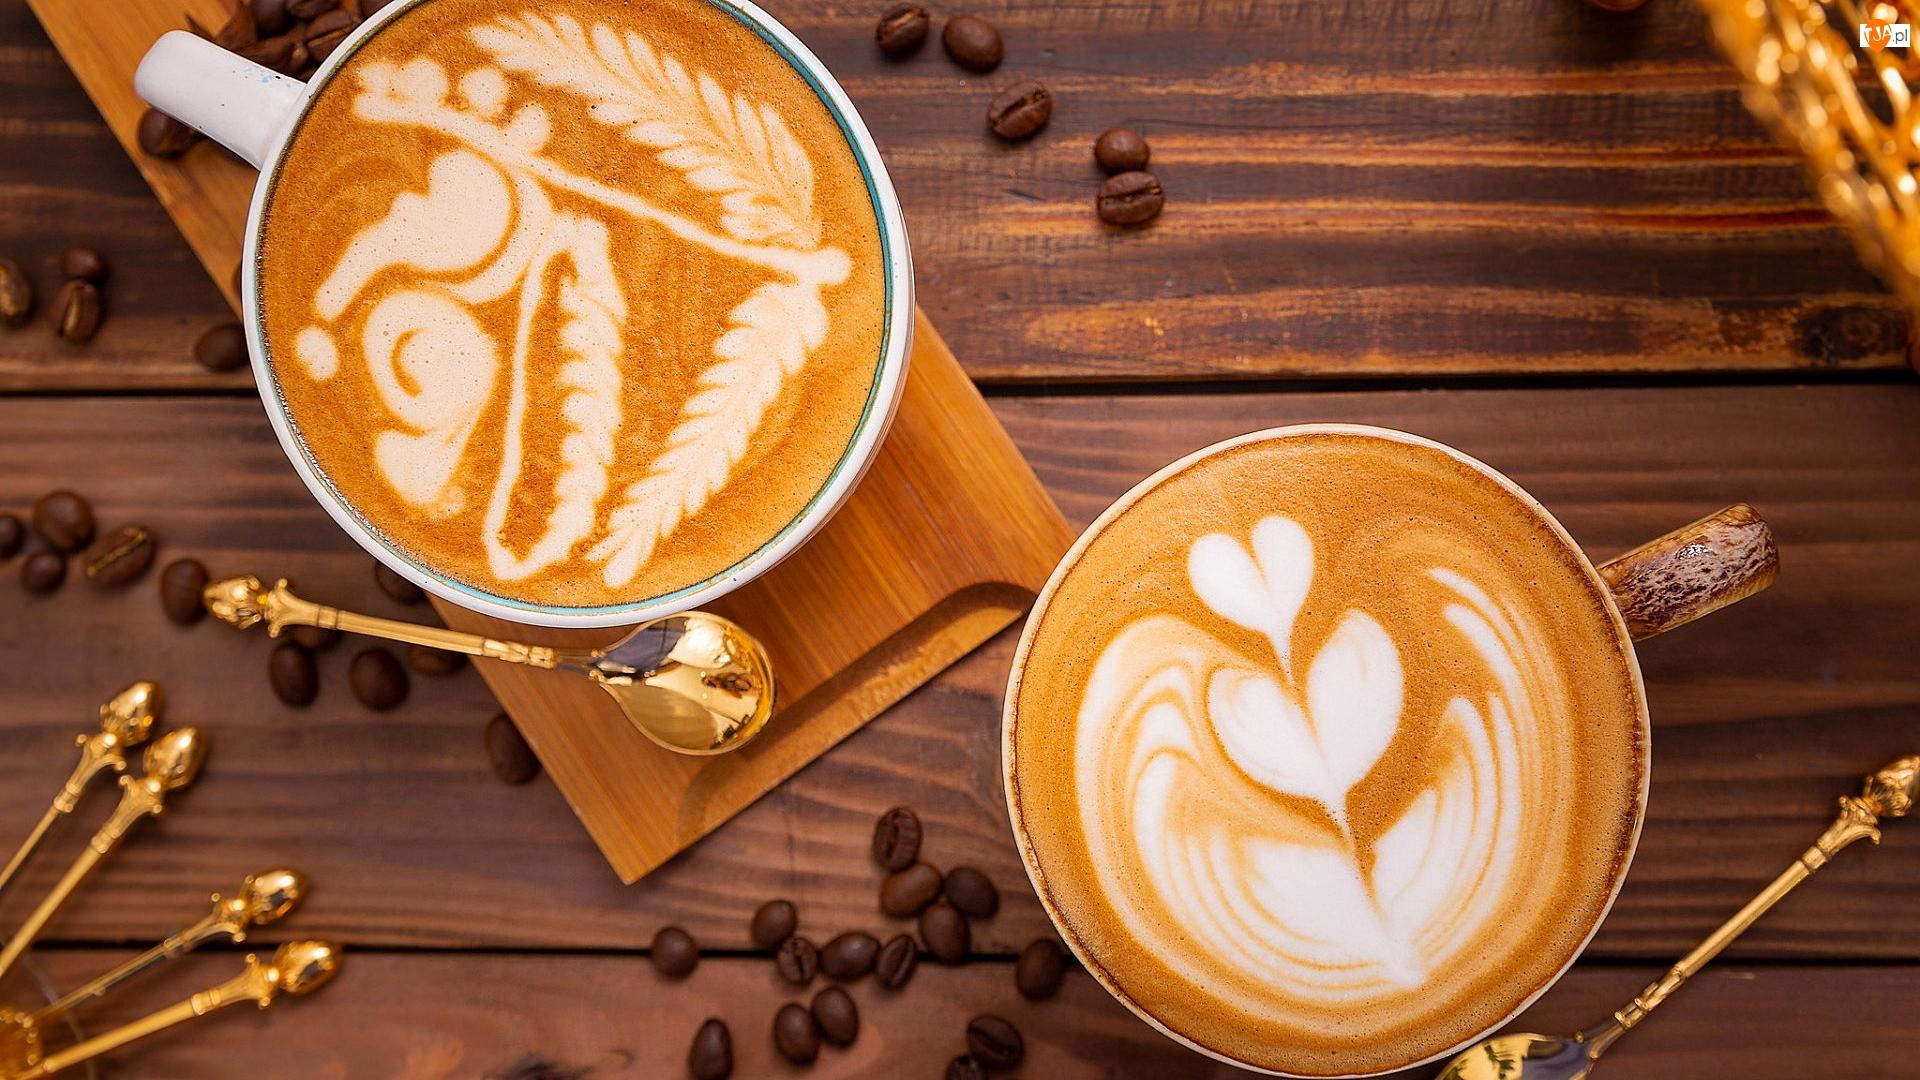 Cappuccino, Łyżeczki, Kubki, Kawa, Deska